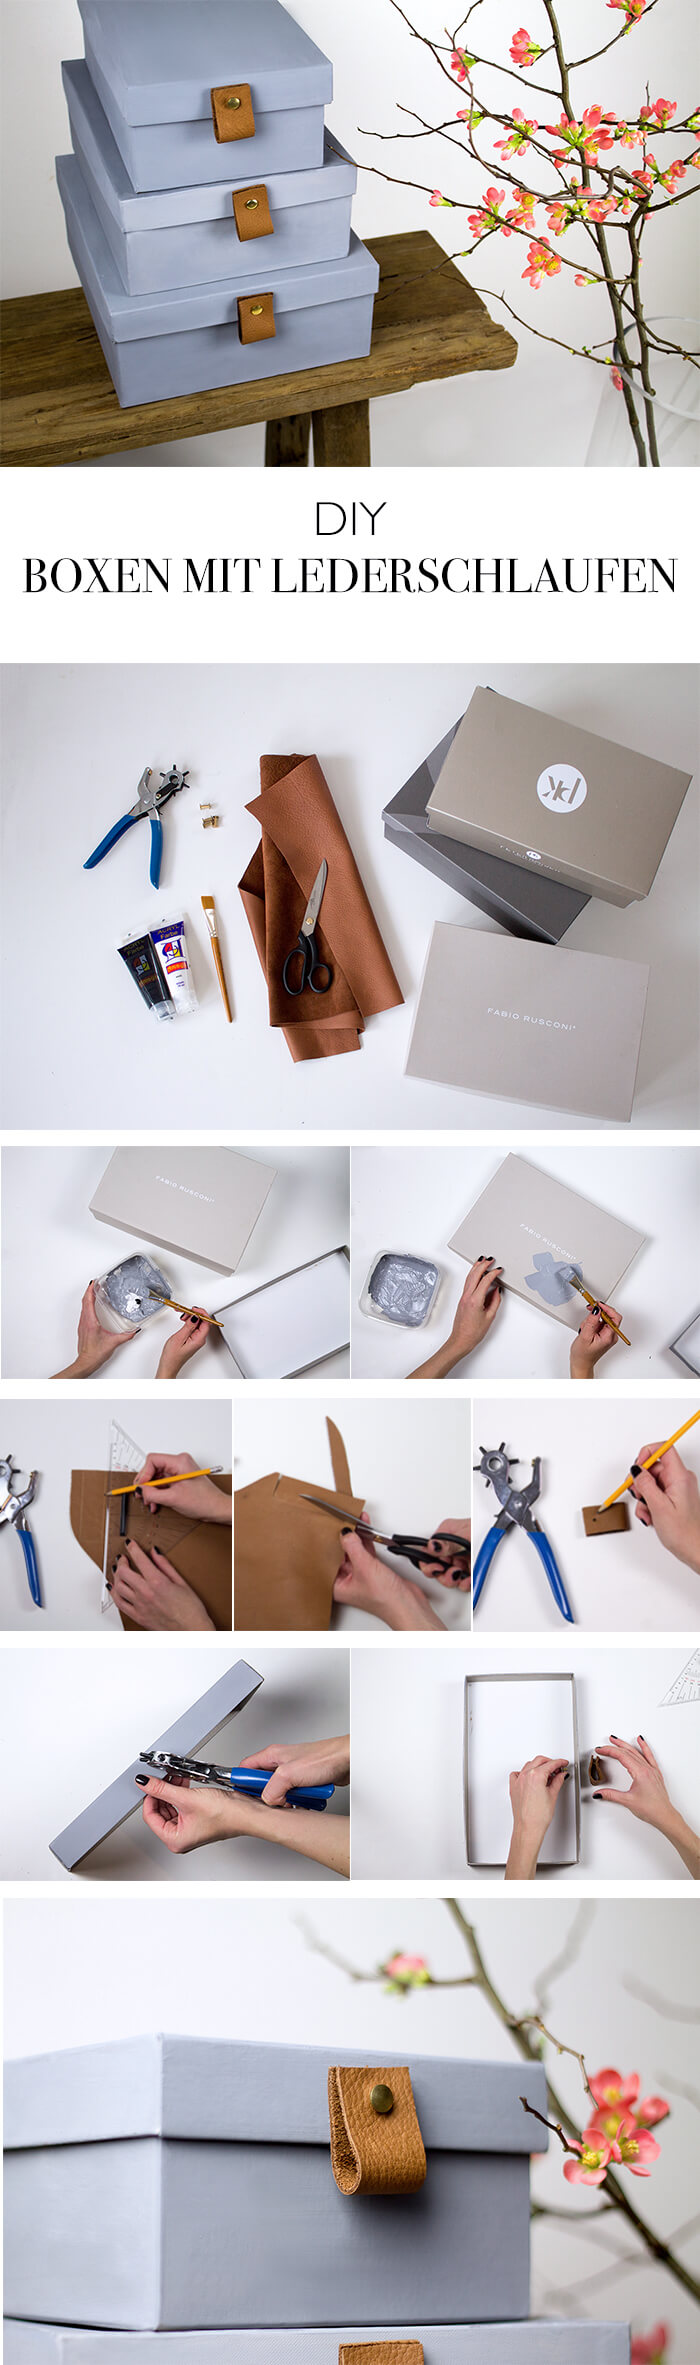 Schuhkarton Upcycling Boxen zur Aufbewahrung mit Lederriemen - DIY Blog aus Berlin lindaloves.de